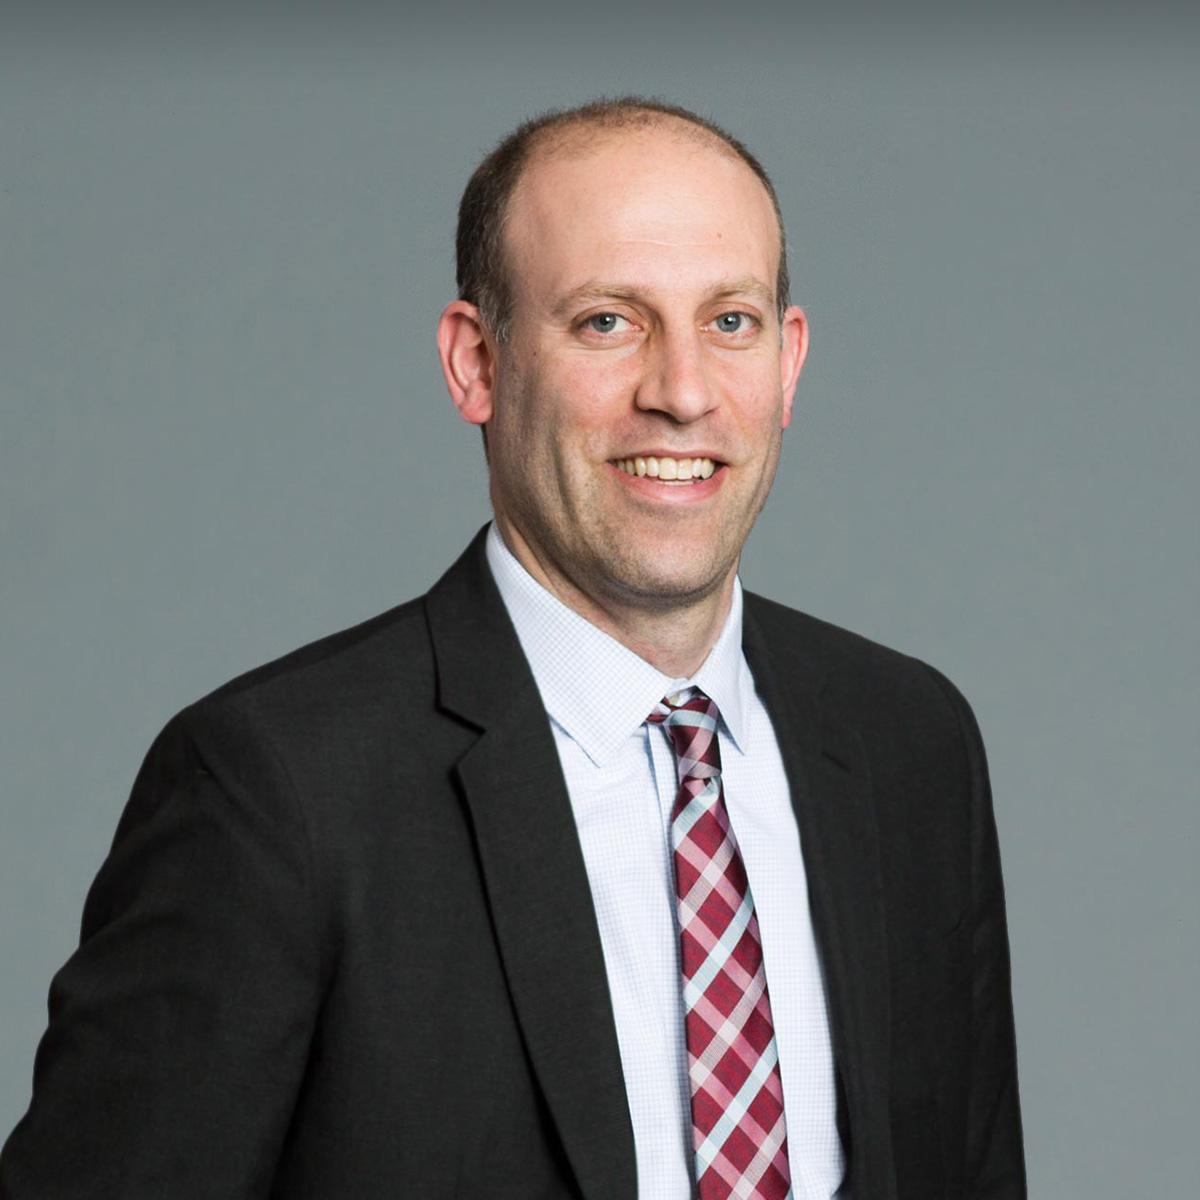 David P Hudesman Headshot